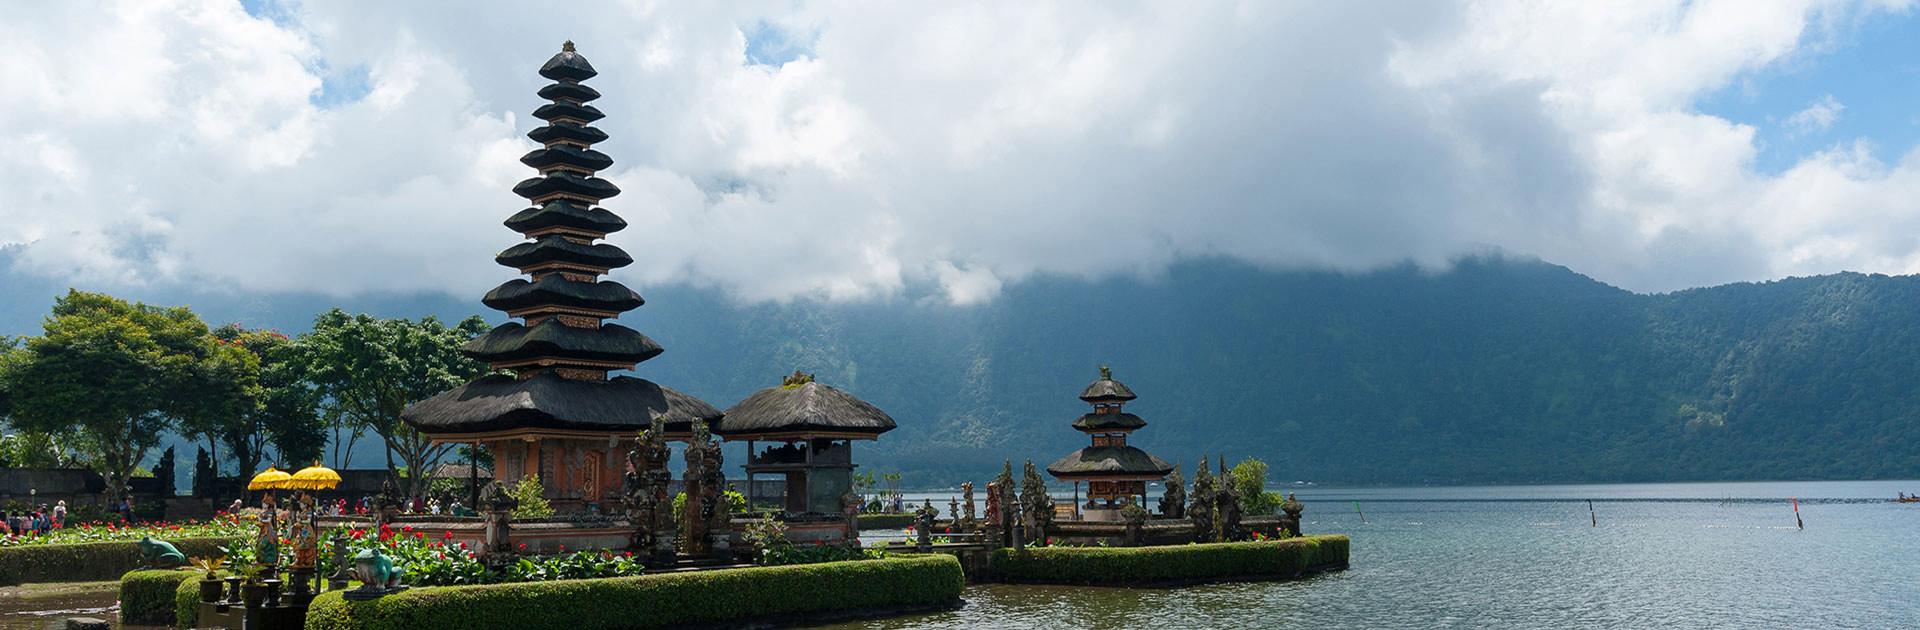 IDMYSG Kuala Lumpur Singapuy y Bali 13 días 3